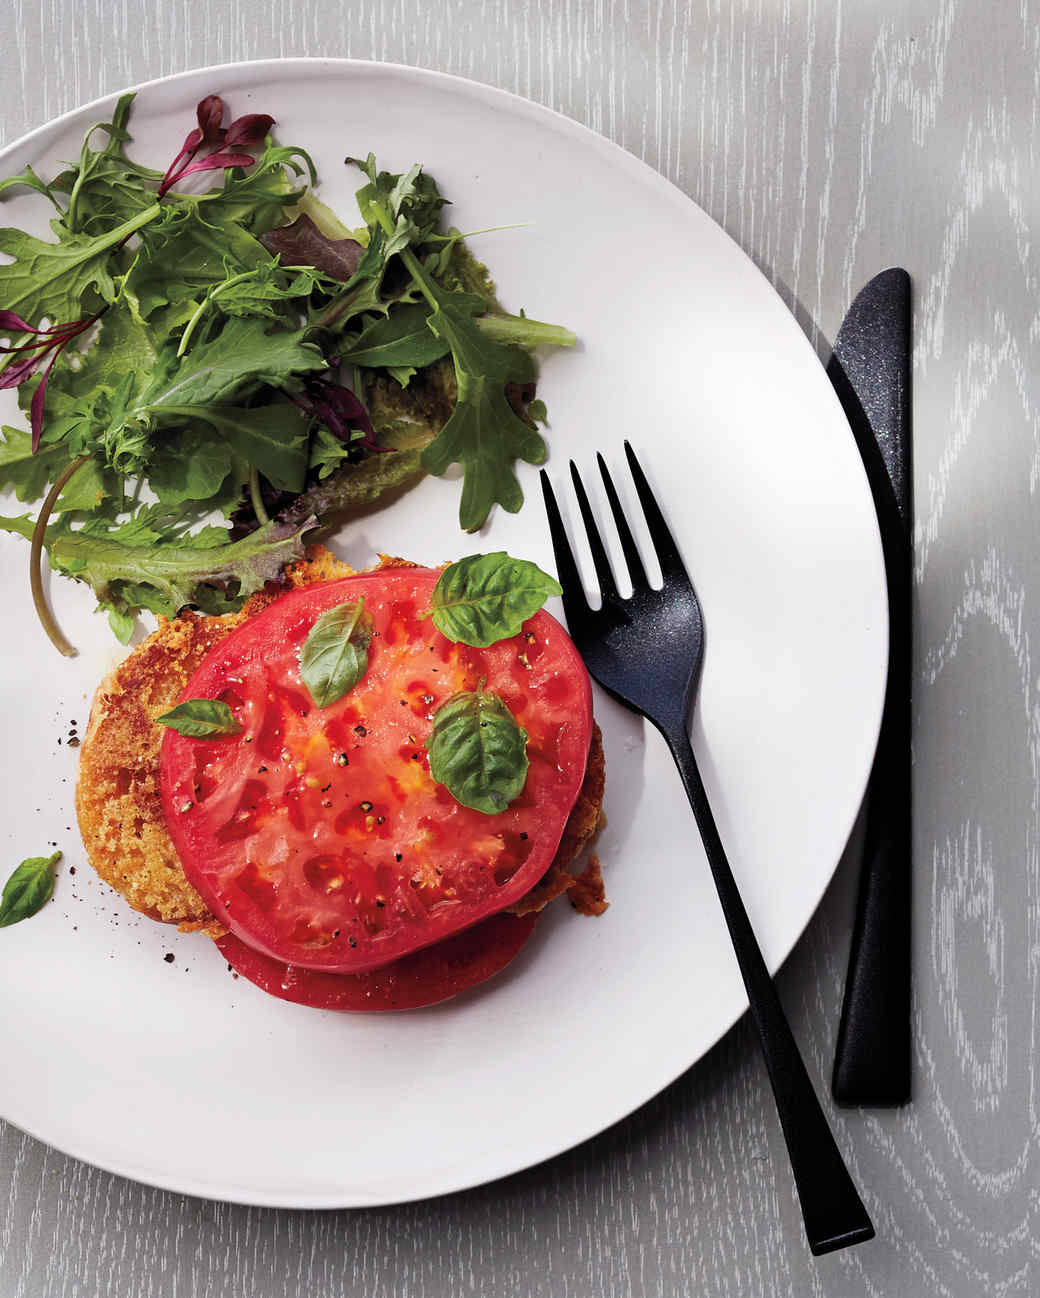 inverted-tomato-sandwich-061-d112142.jpg